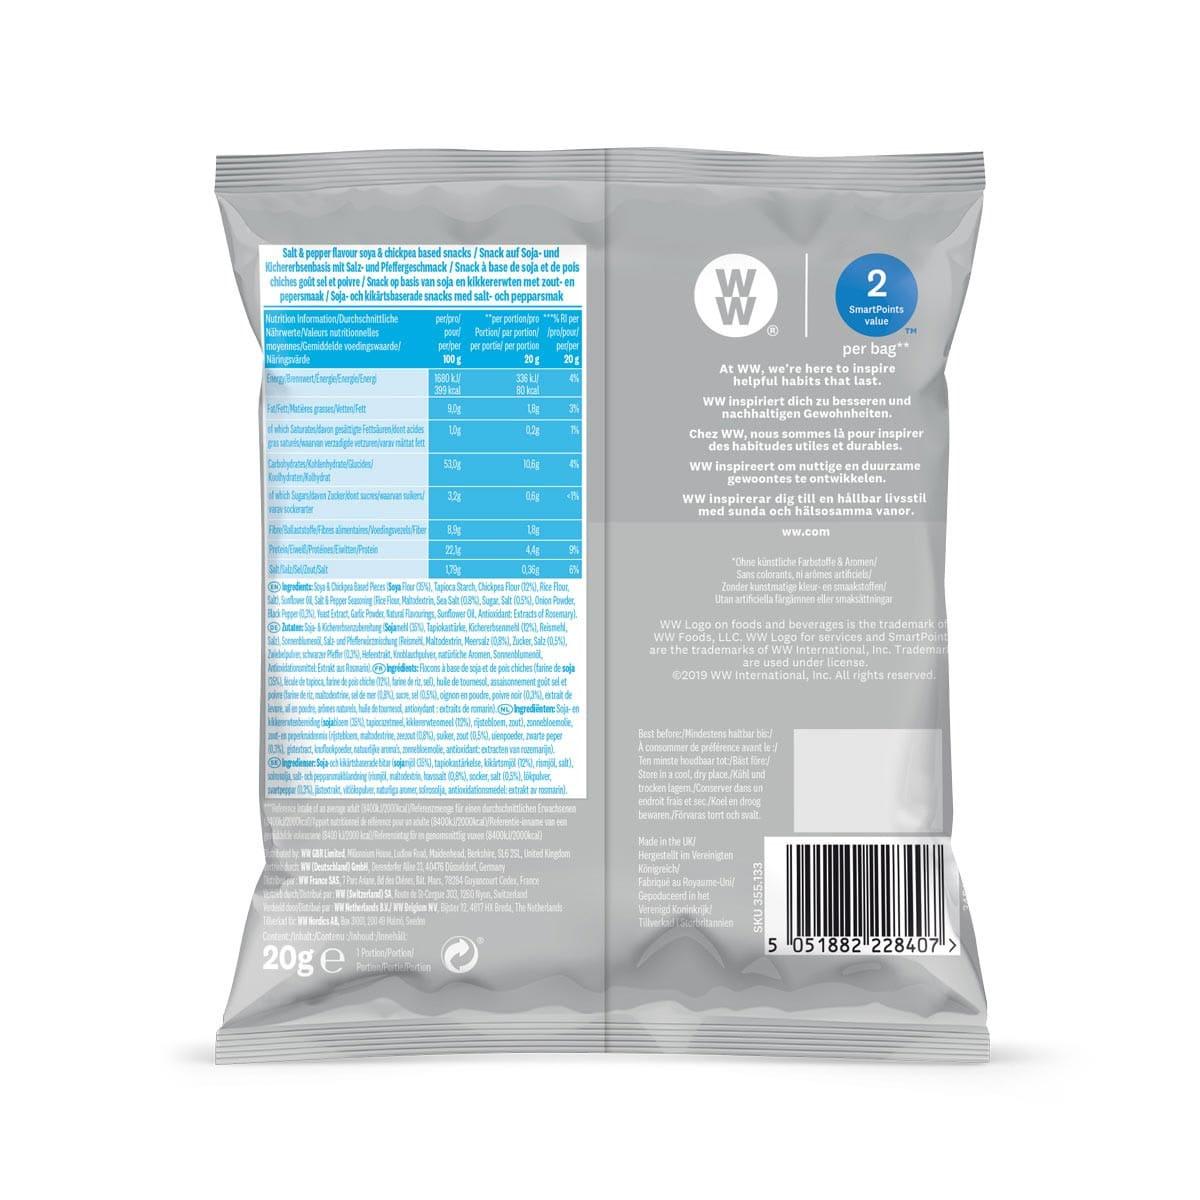 WW Salz & Pfeffer Chips 5er Pack 2